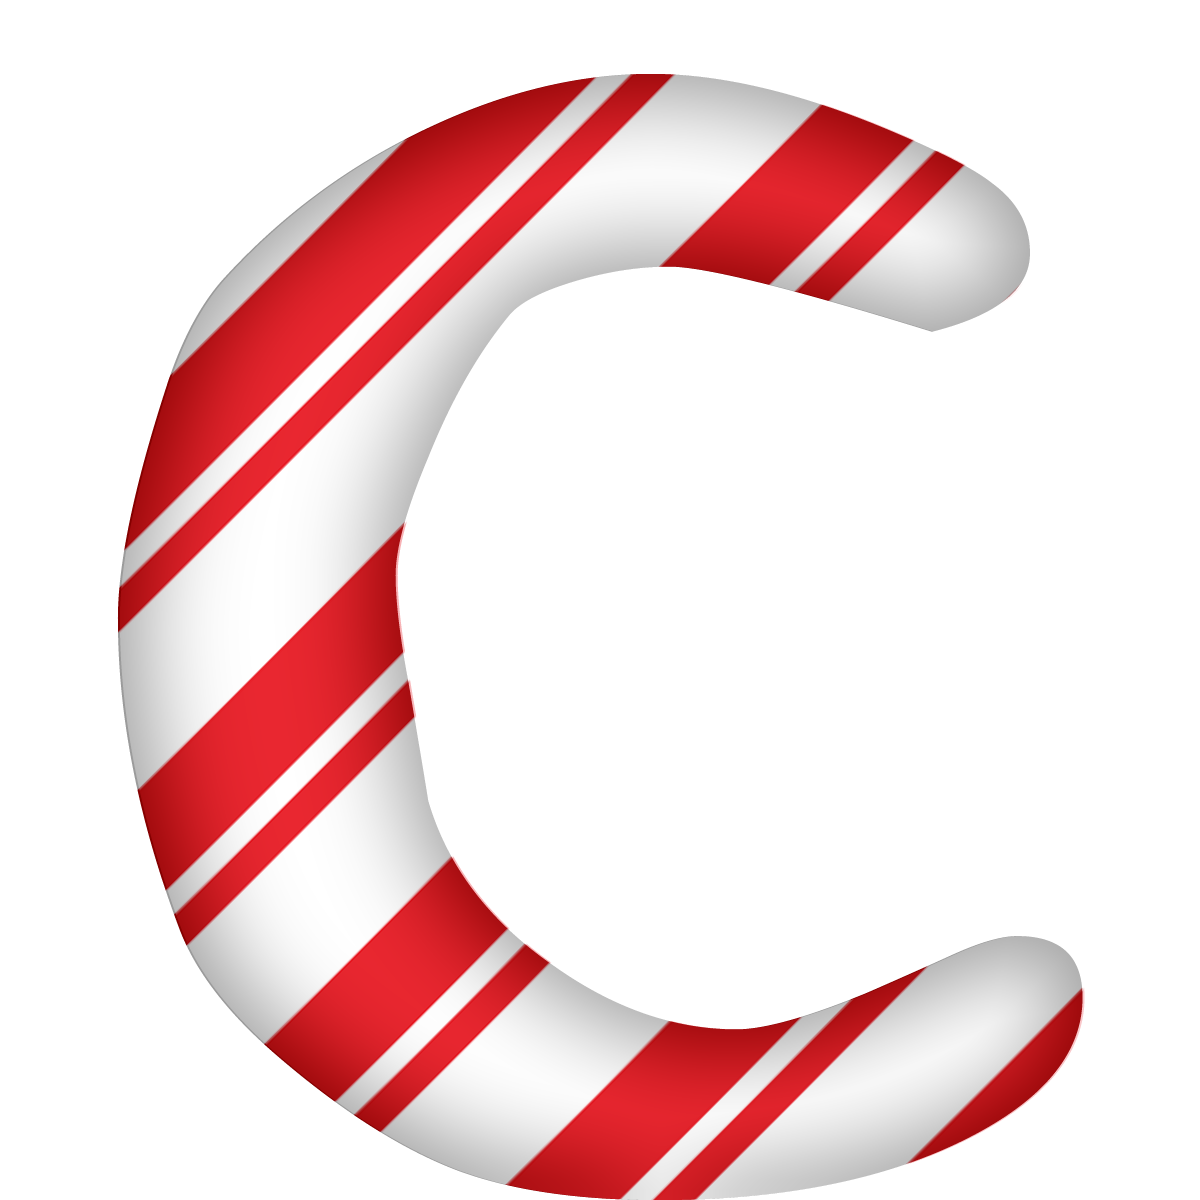 Capital Letter C Png 1200 1200 Christmas Lettering Christmas Alphabet Free Digital Scrapbooking